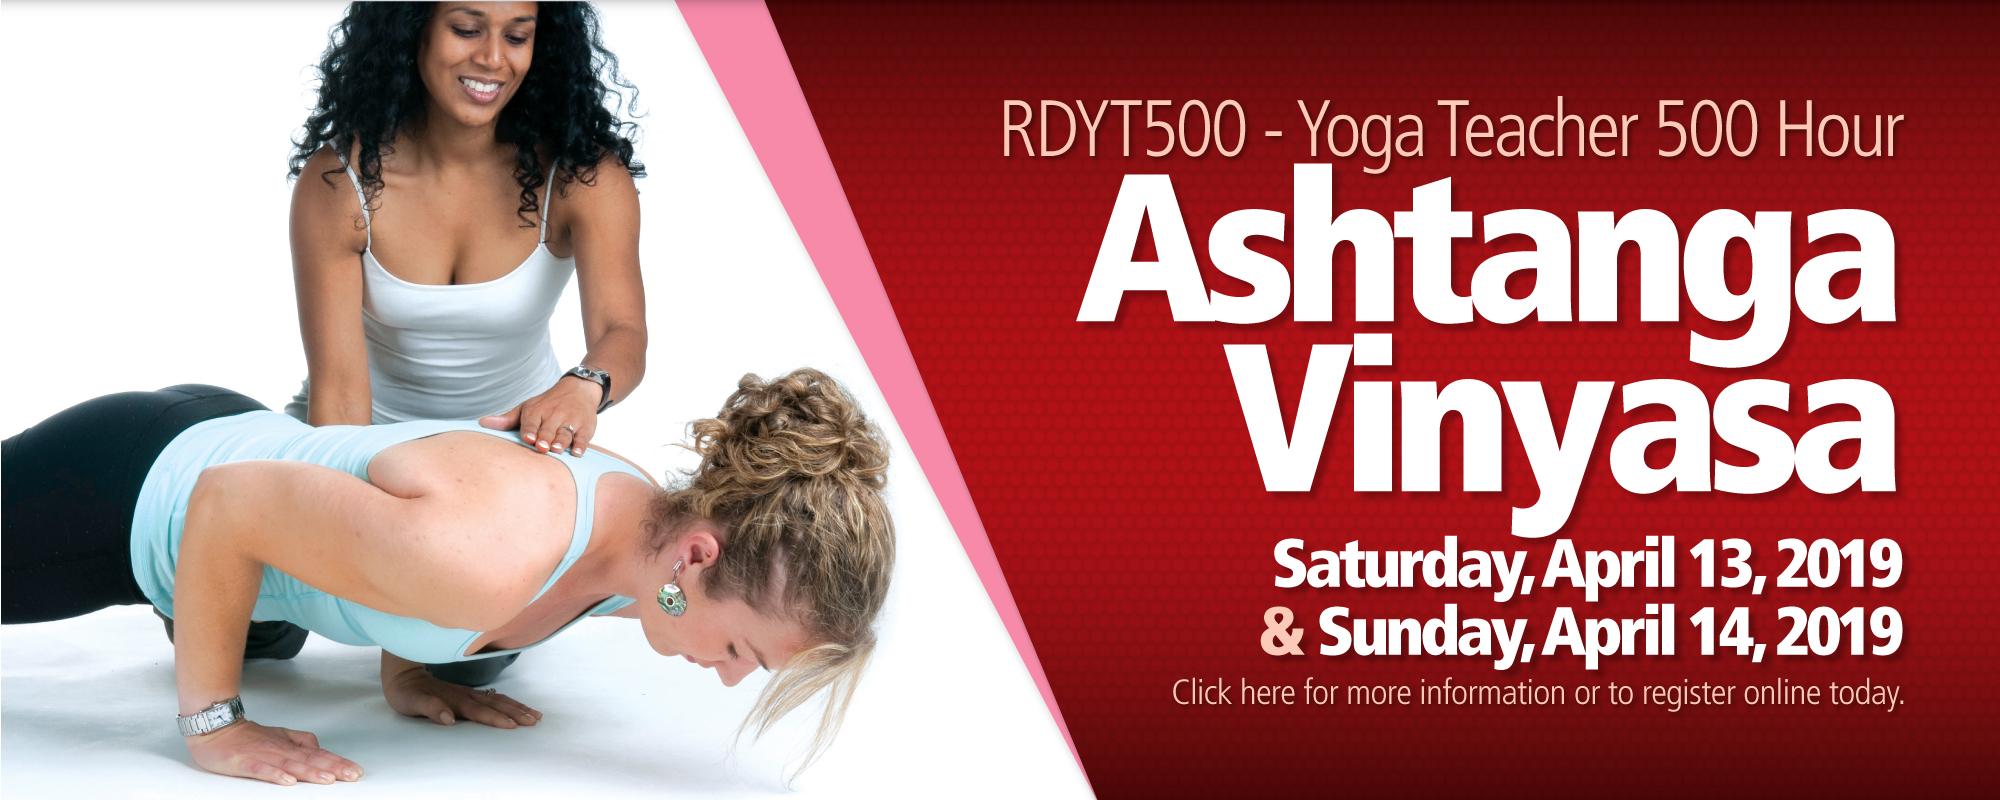 Splash-Page-04-19-RDYT500-Ashtanga